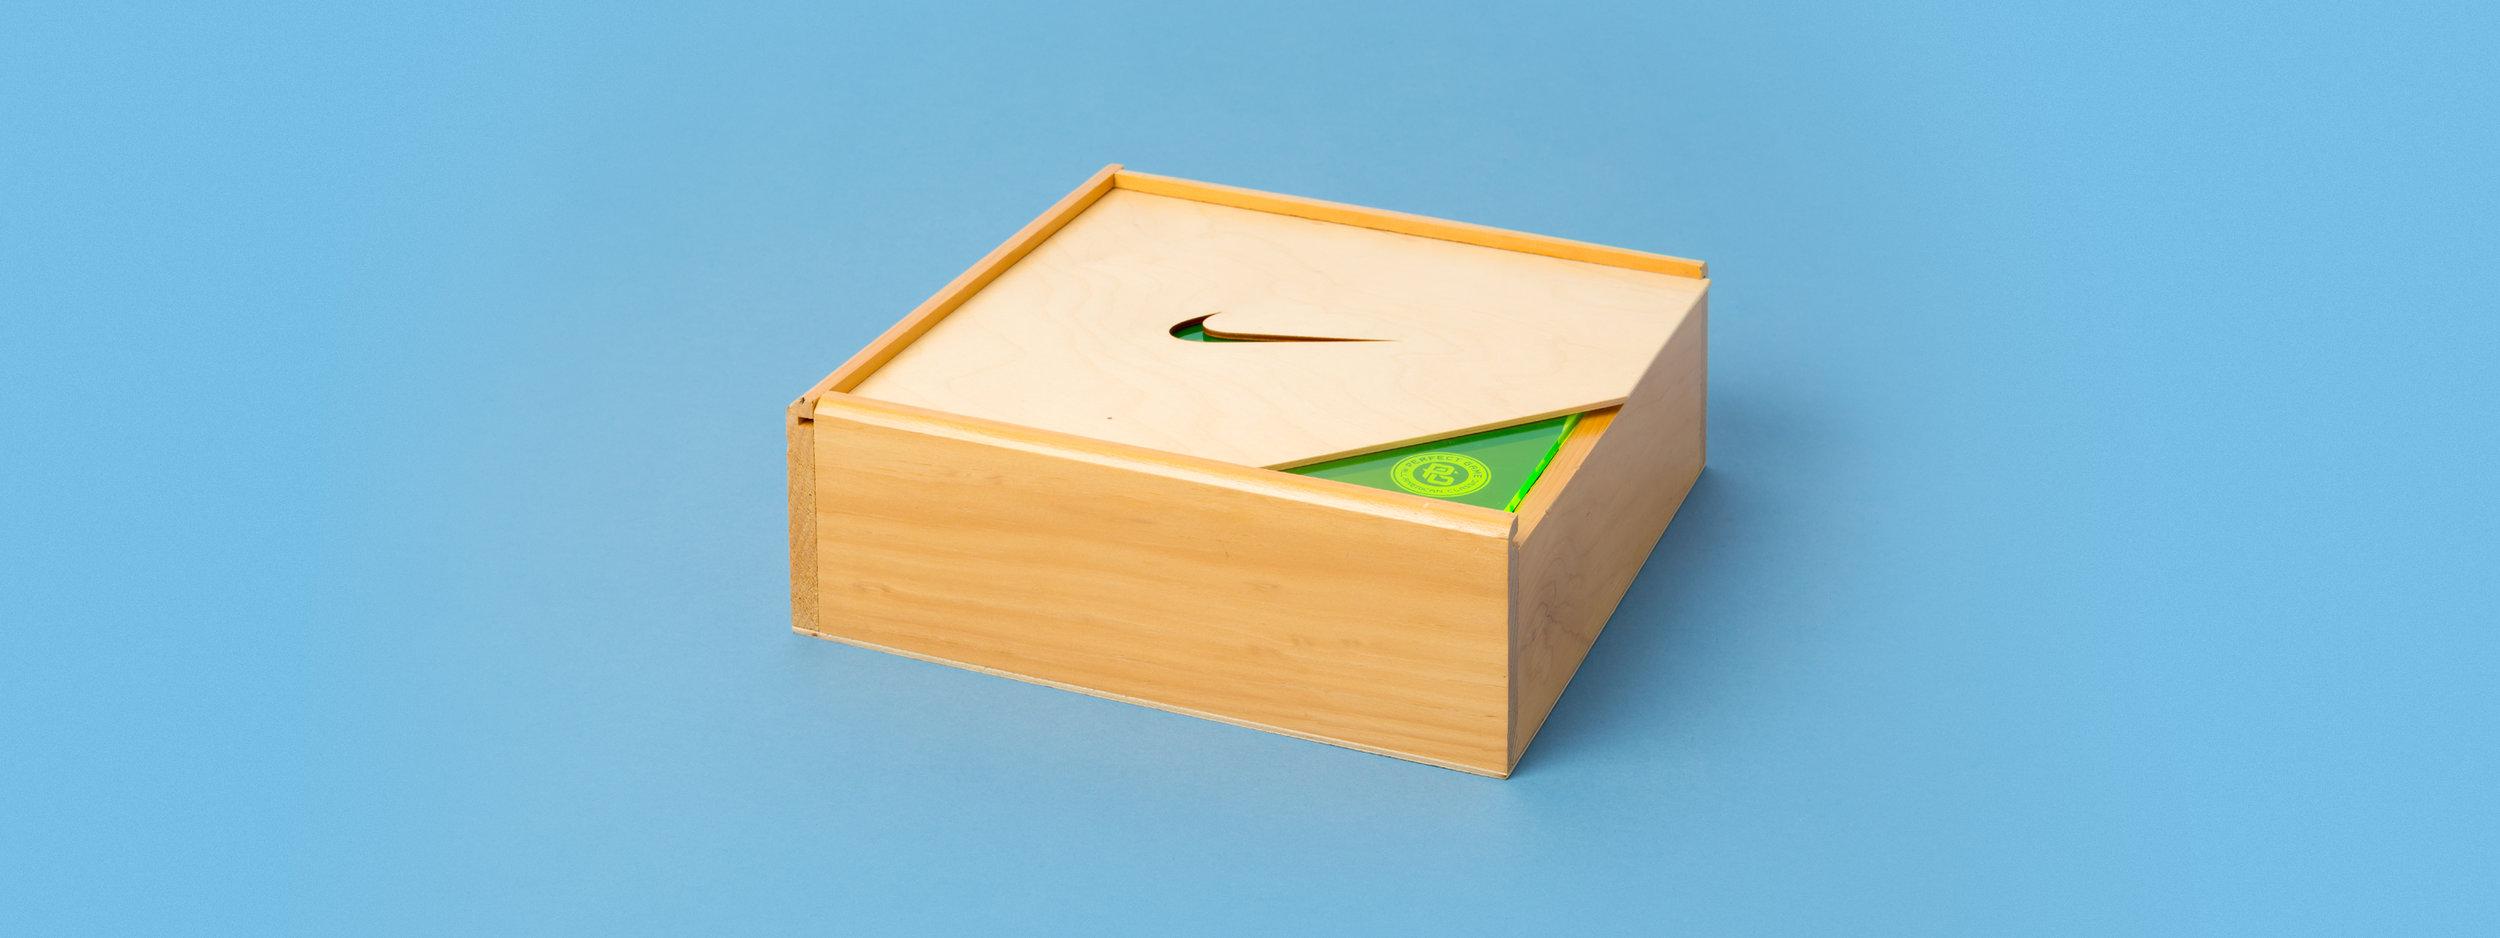 Laser engraved box, laser cut box, nike seeding kit, custom fabrication, portland